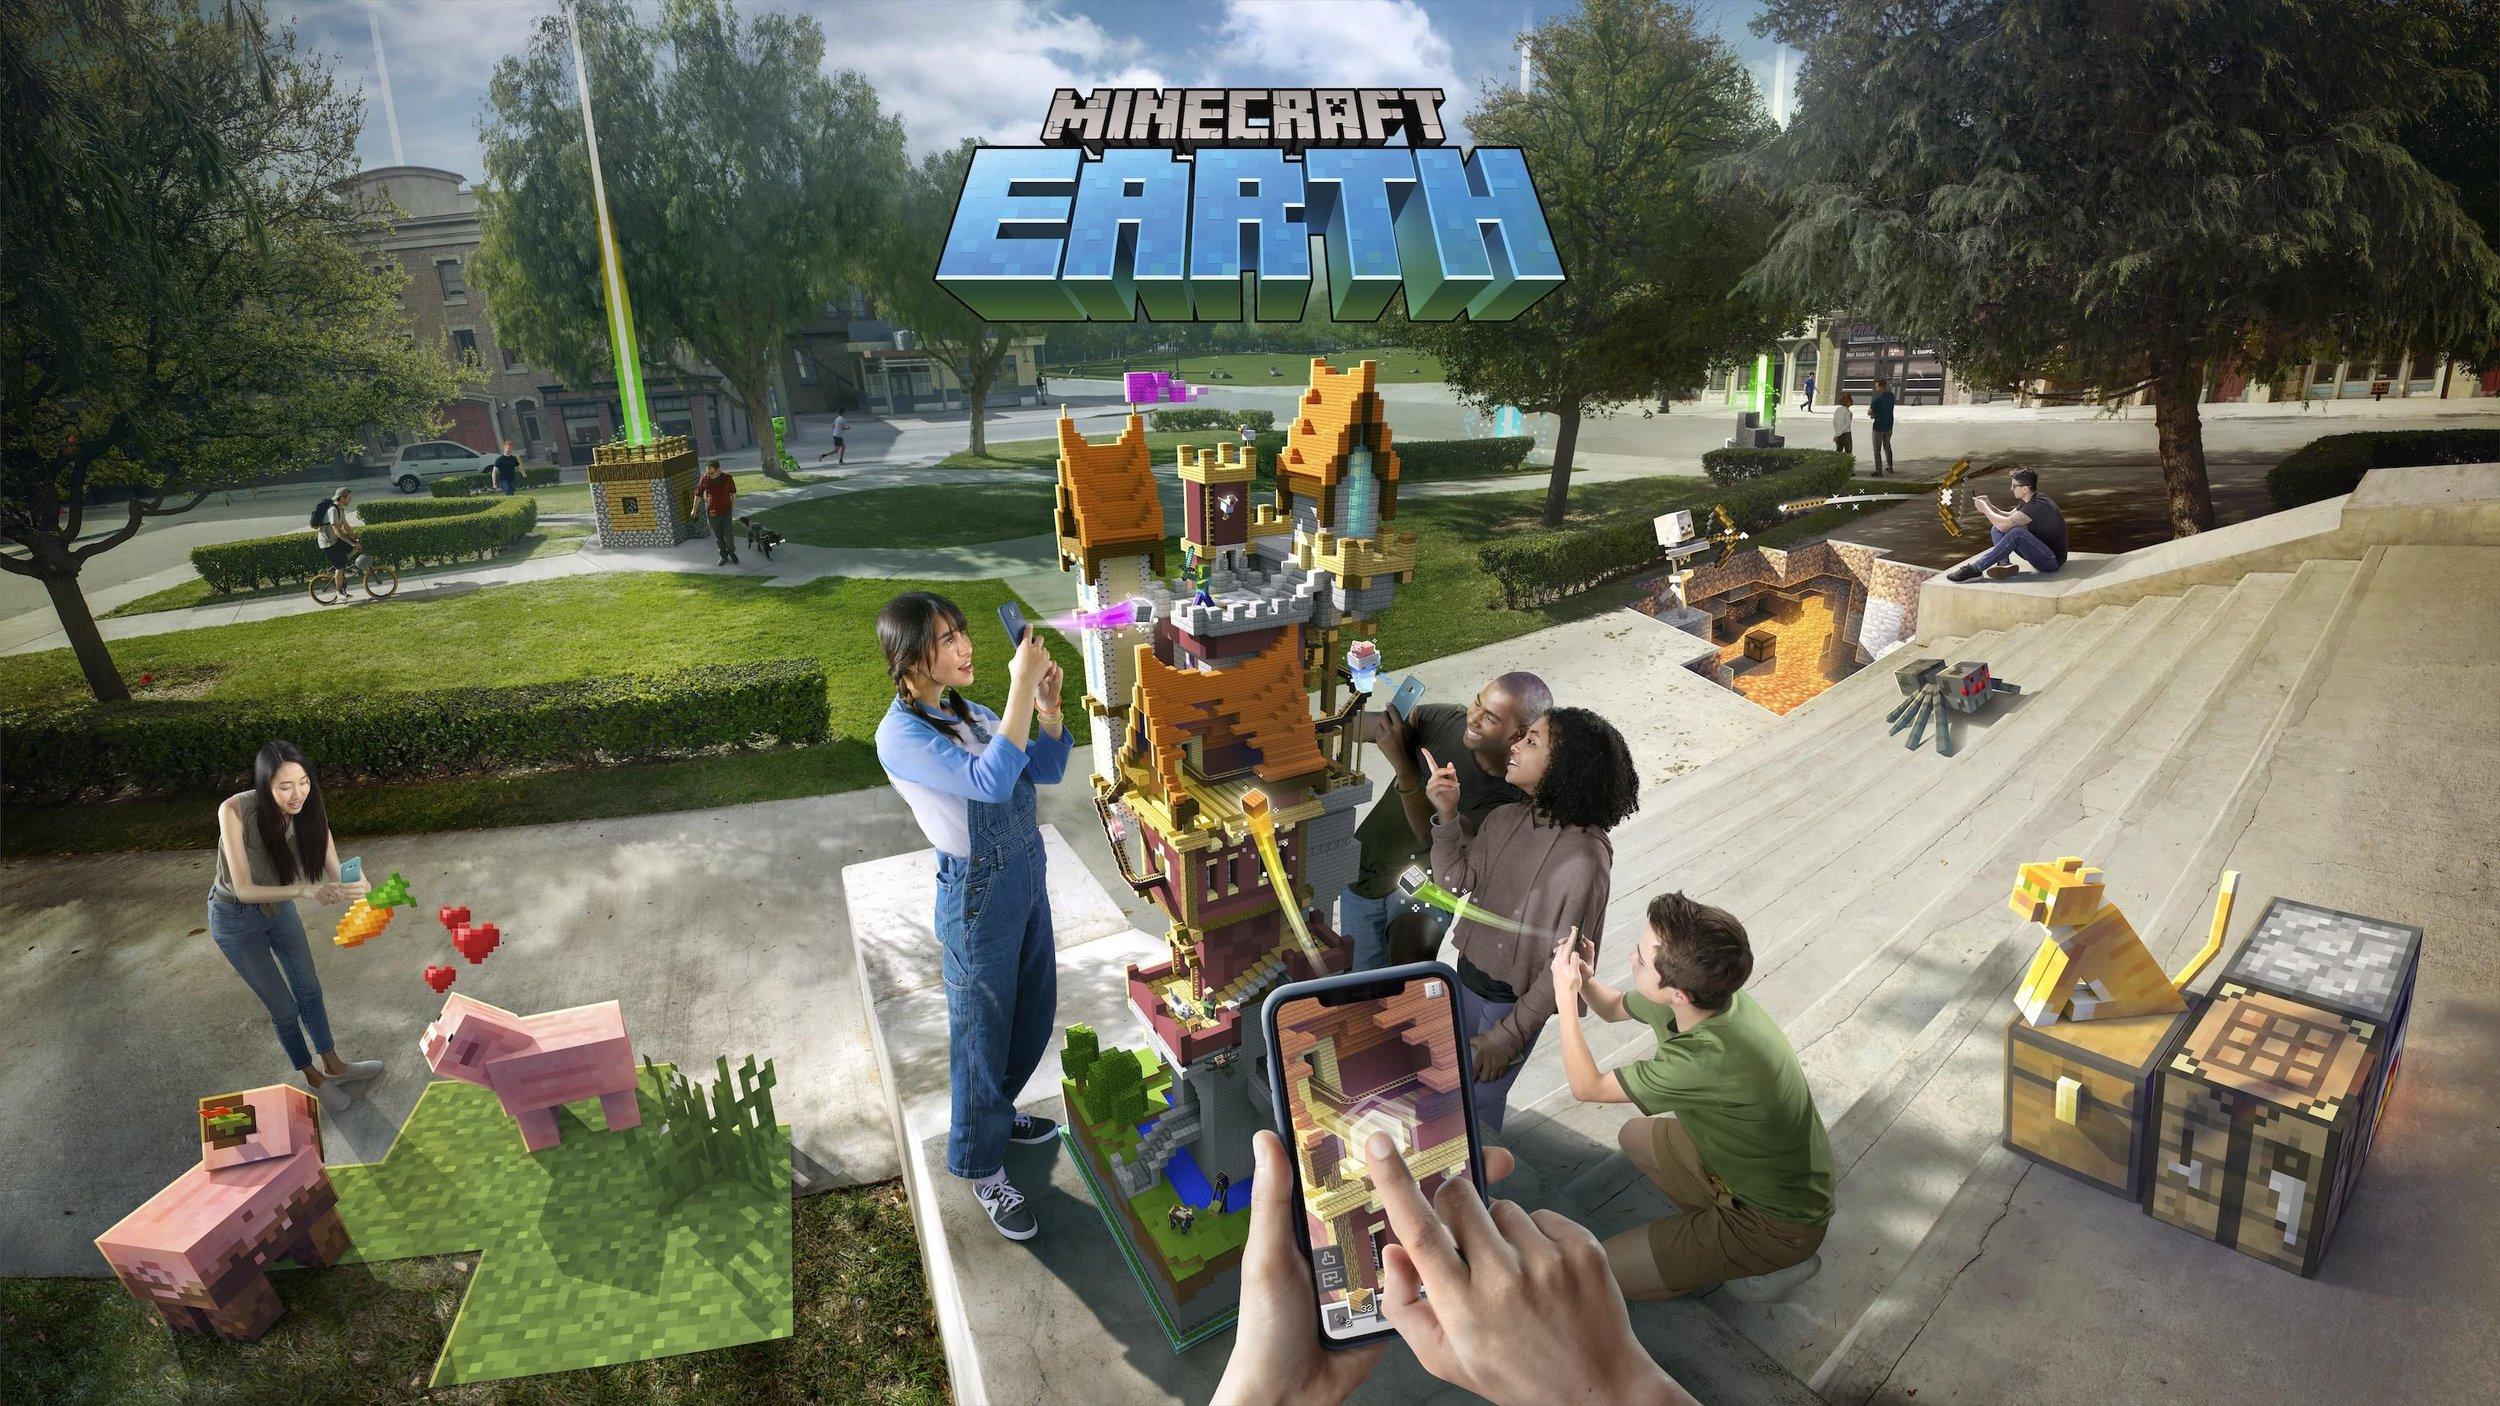 Atomhawk_Microsoft_Minecraft+Earth_Marketing+Art_Logo+Announcement+Art_Key+Art_Services.jpg